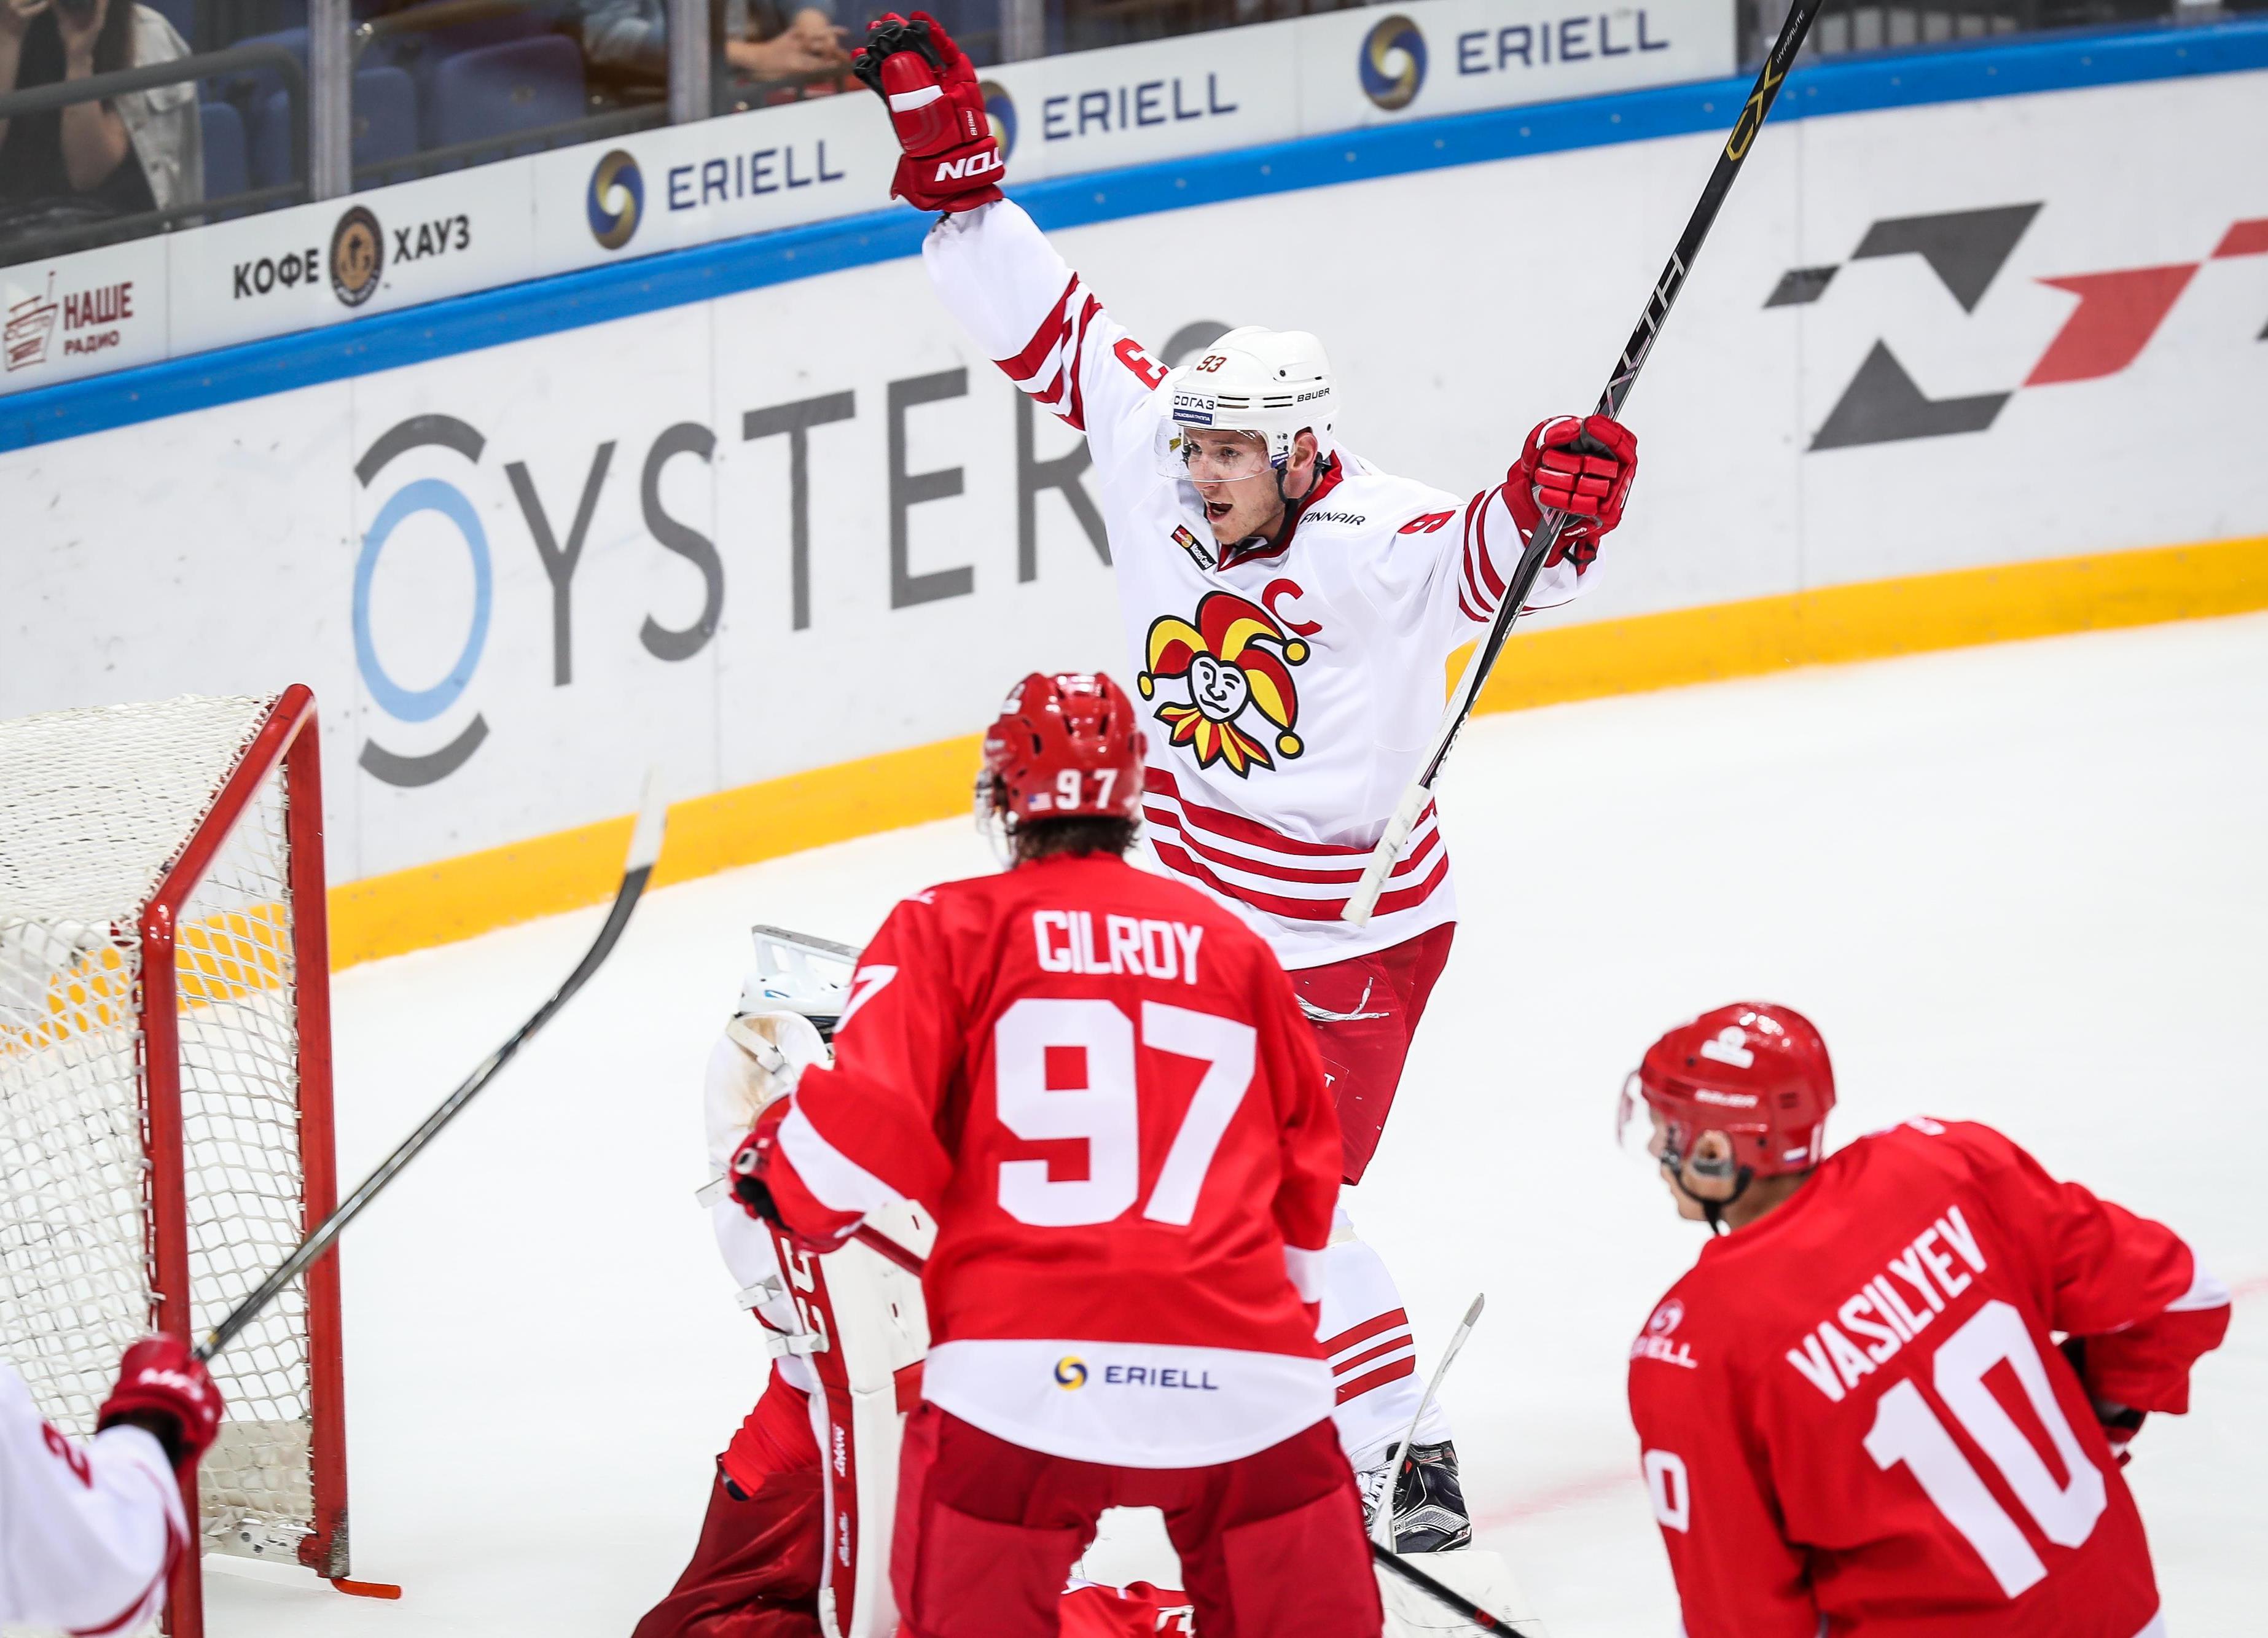 Jokerit Helsinki auf KHL-Erfolgswelle